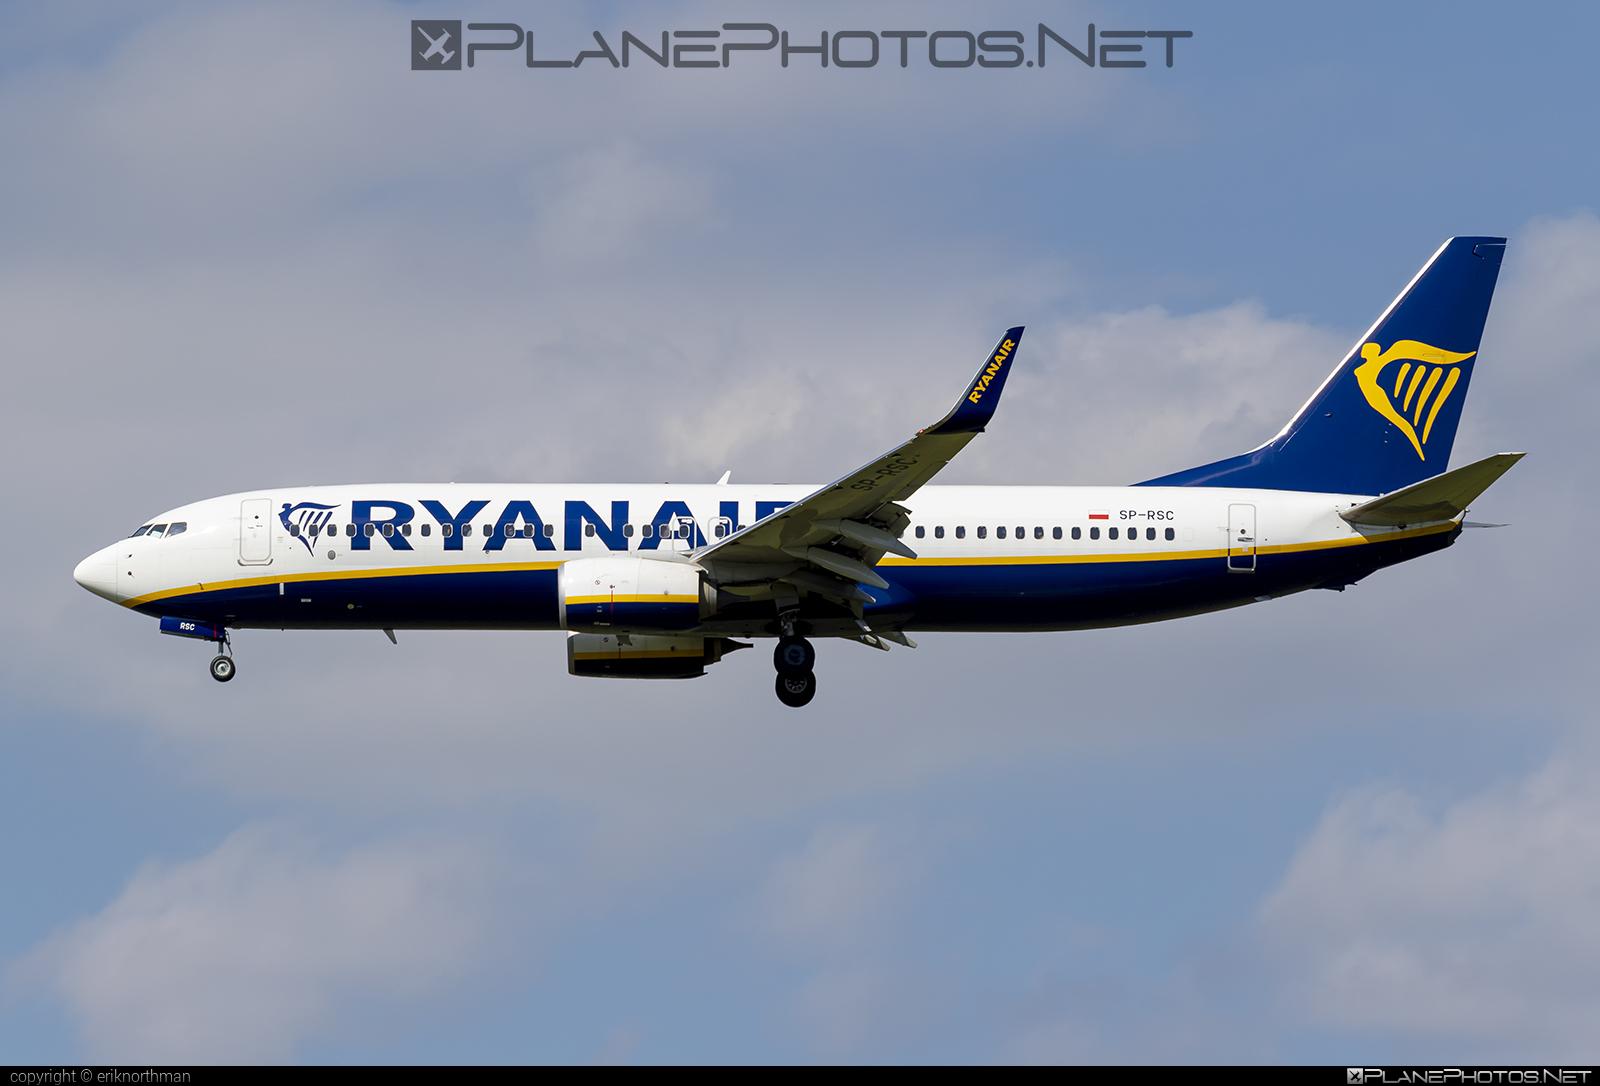 Boeing 737-800 - SP-RSC operated by Ryanair Sun #b737 #b737nextgen #b737ng #boeing #boeing737 #ryanair #ryanairsun